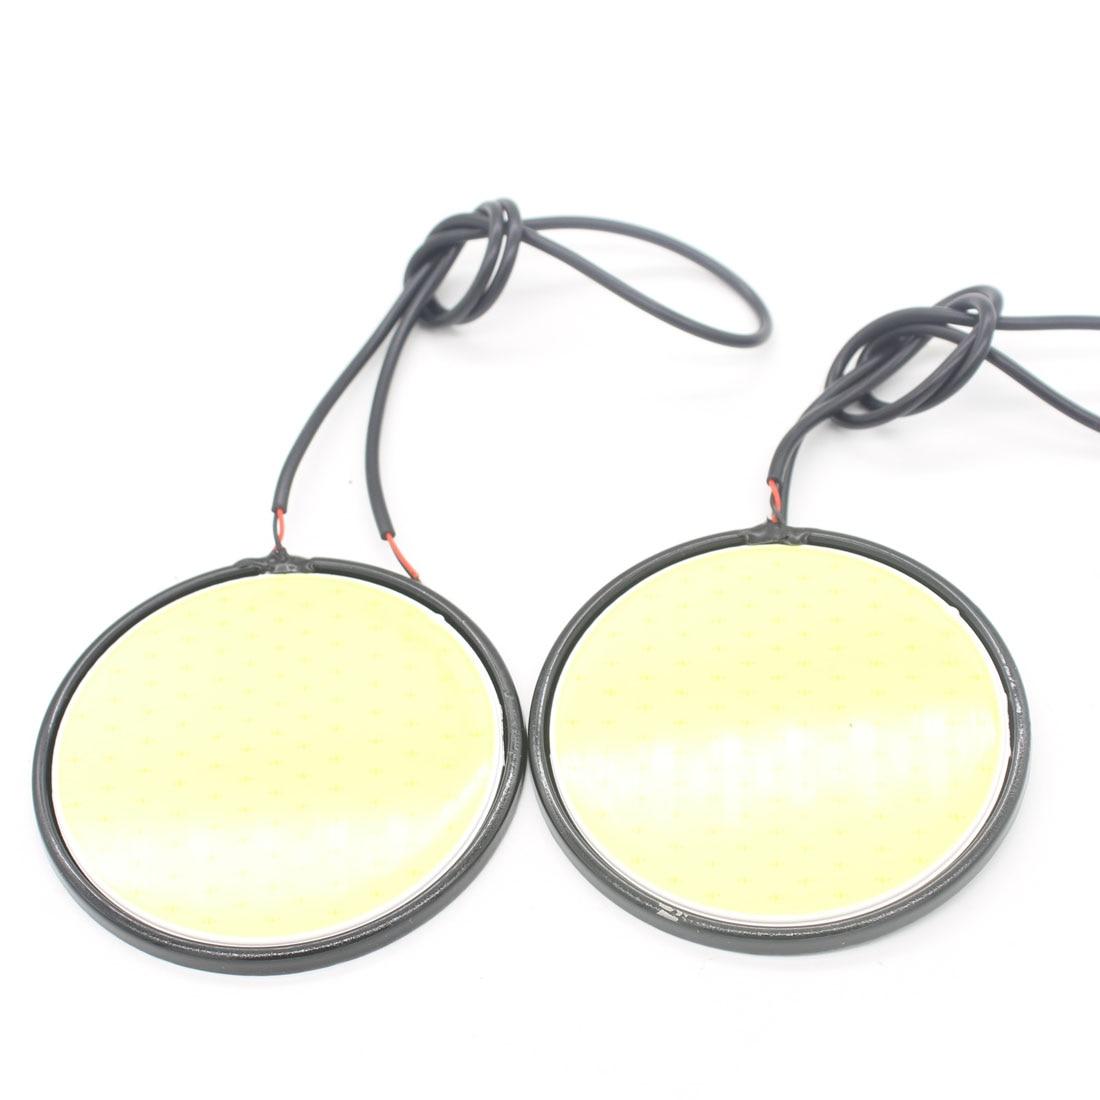 2X Auto Car LED COB Daytime Running Light Warning Turn Signal Light Fog Reverse Light Interior